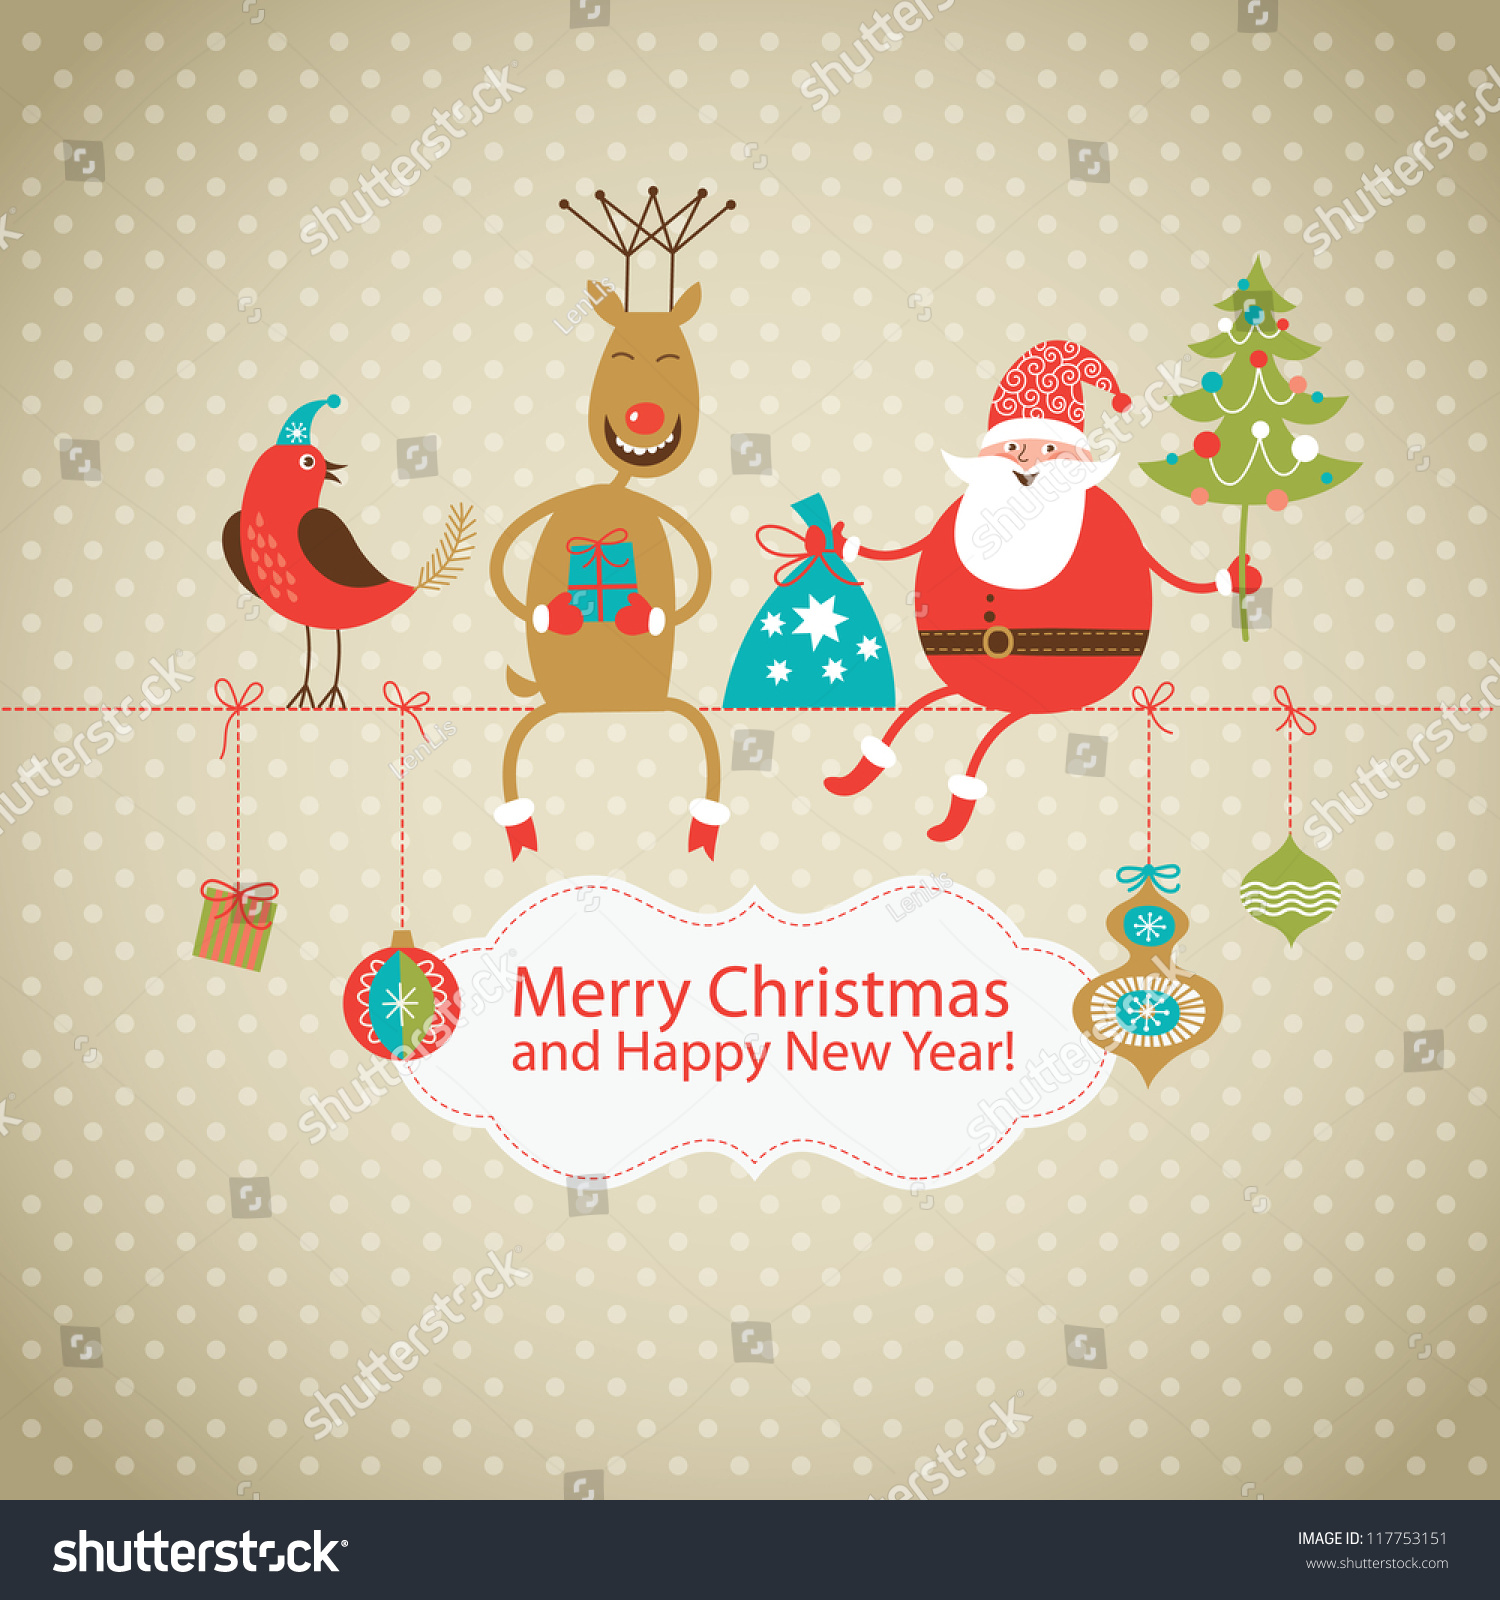 how to make christmas tree and santa claus